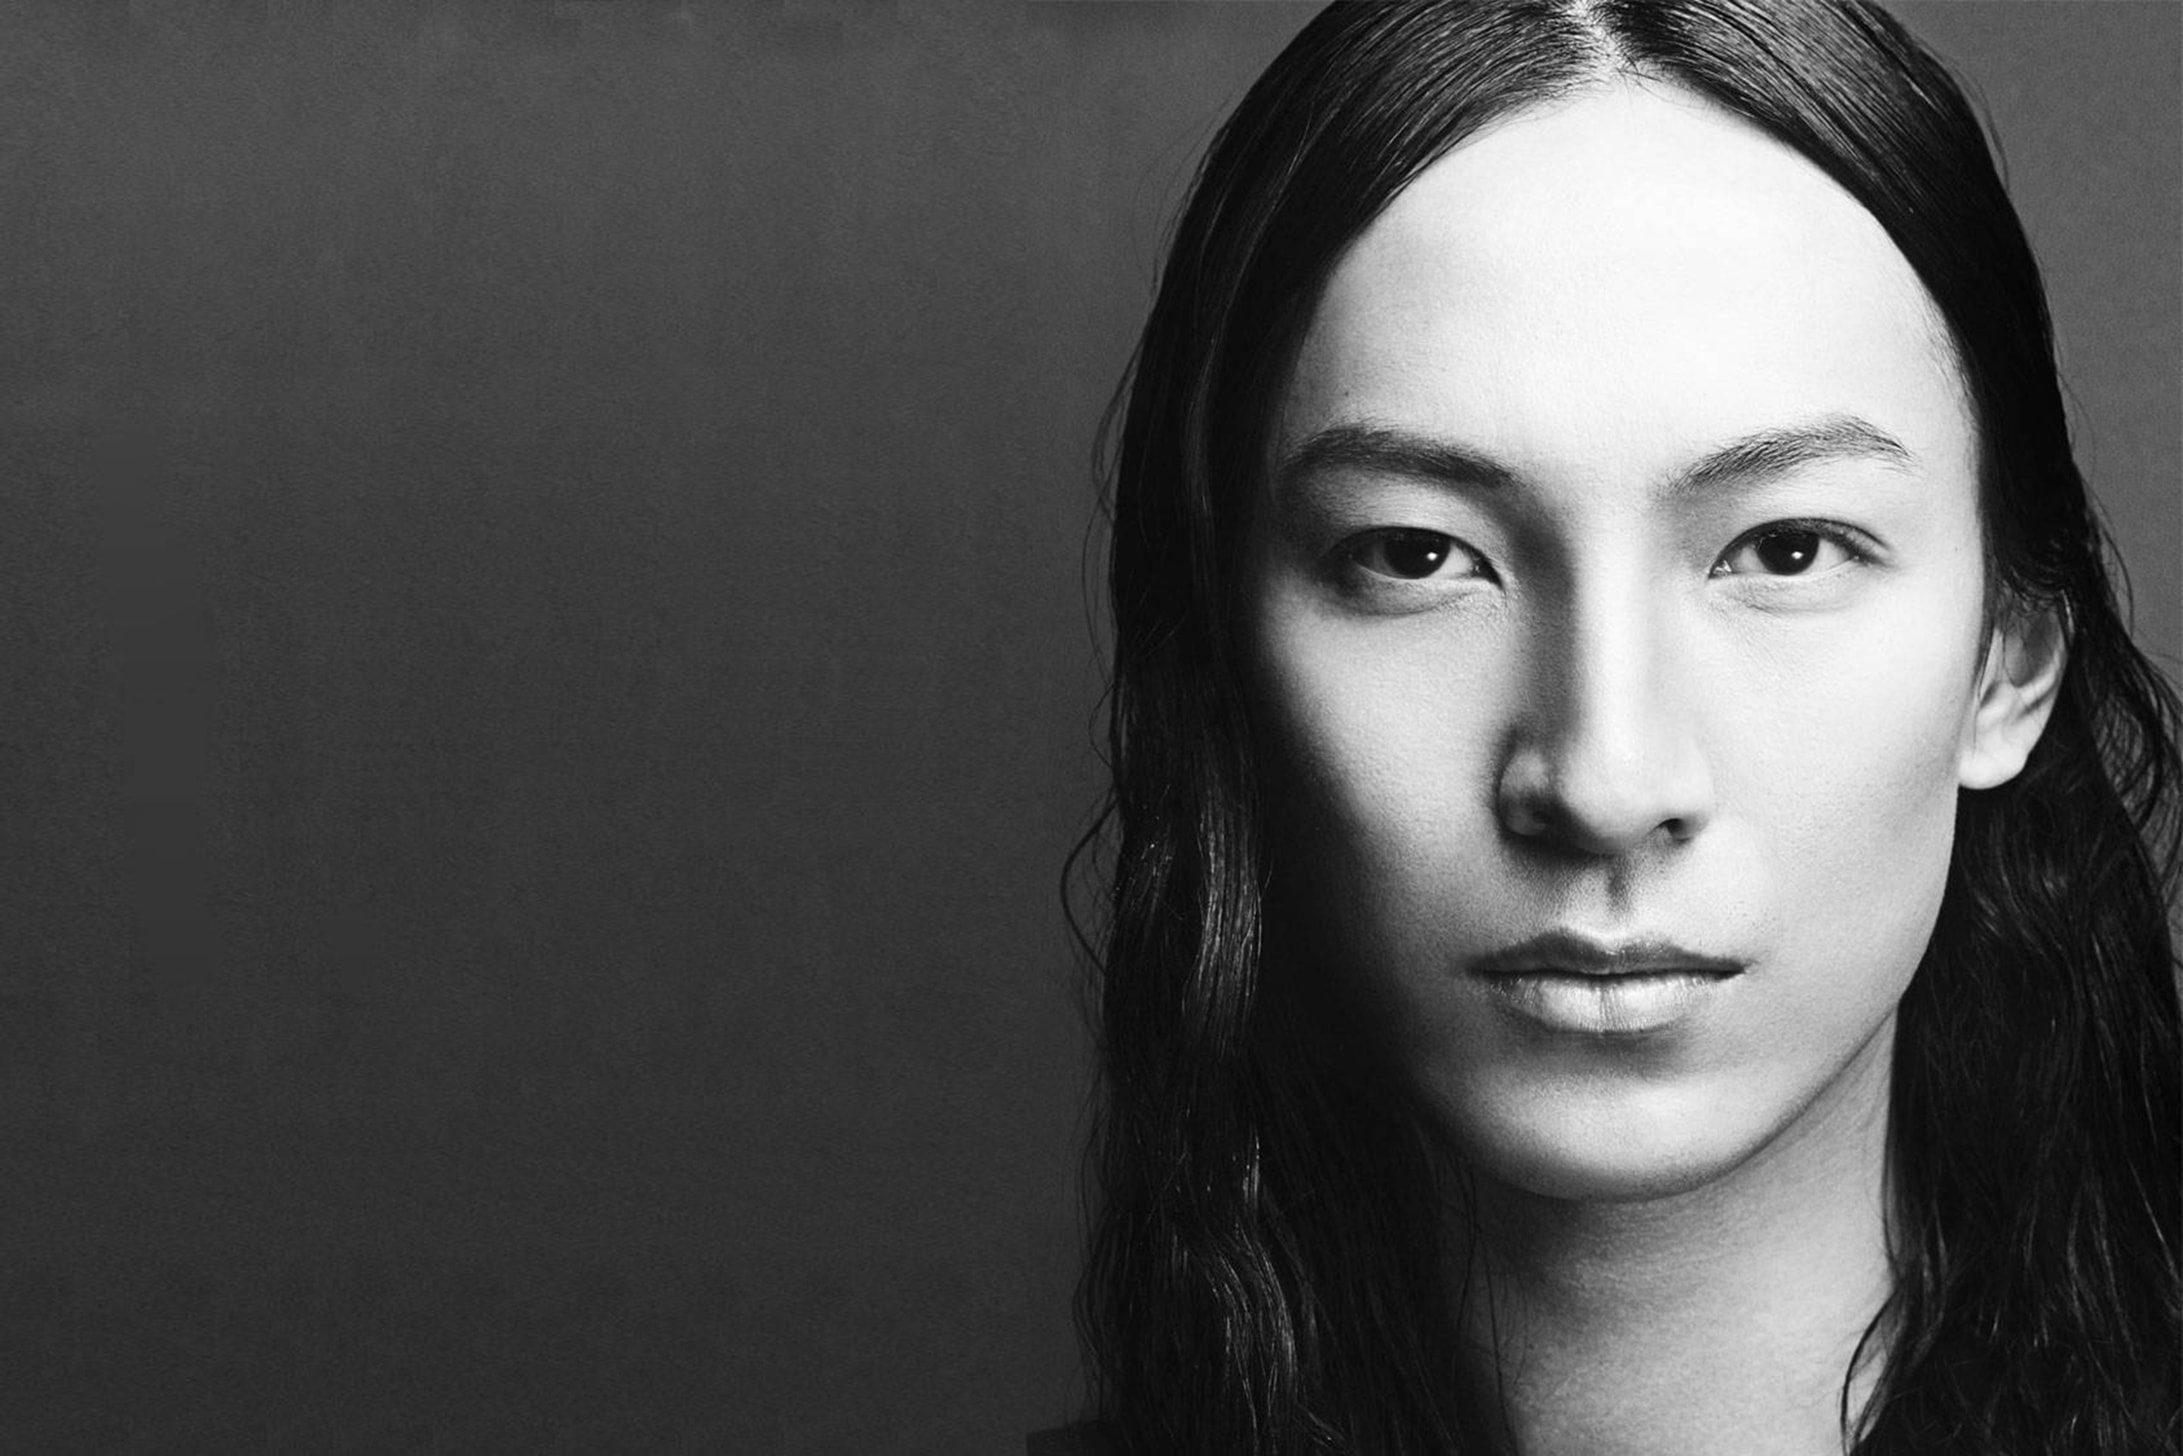 alexander-wang-fashion-designer-runway-eleonora-de-gray-editor-in-chief-runway-magazine The three WANGs